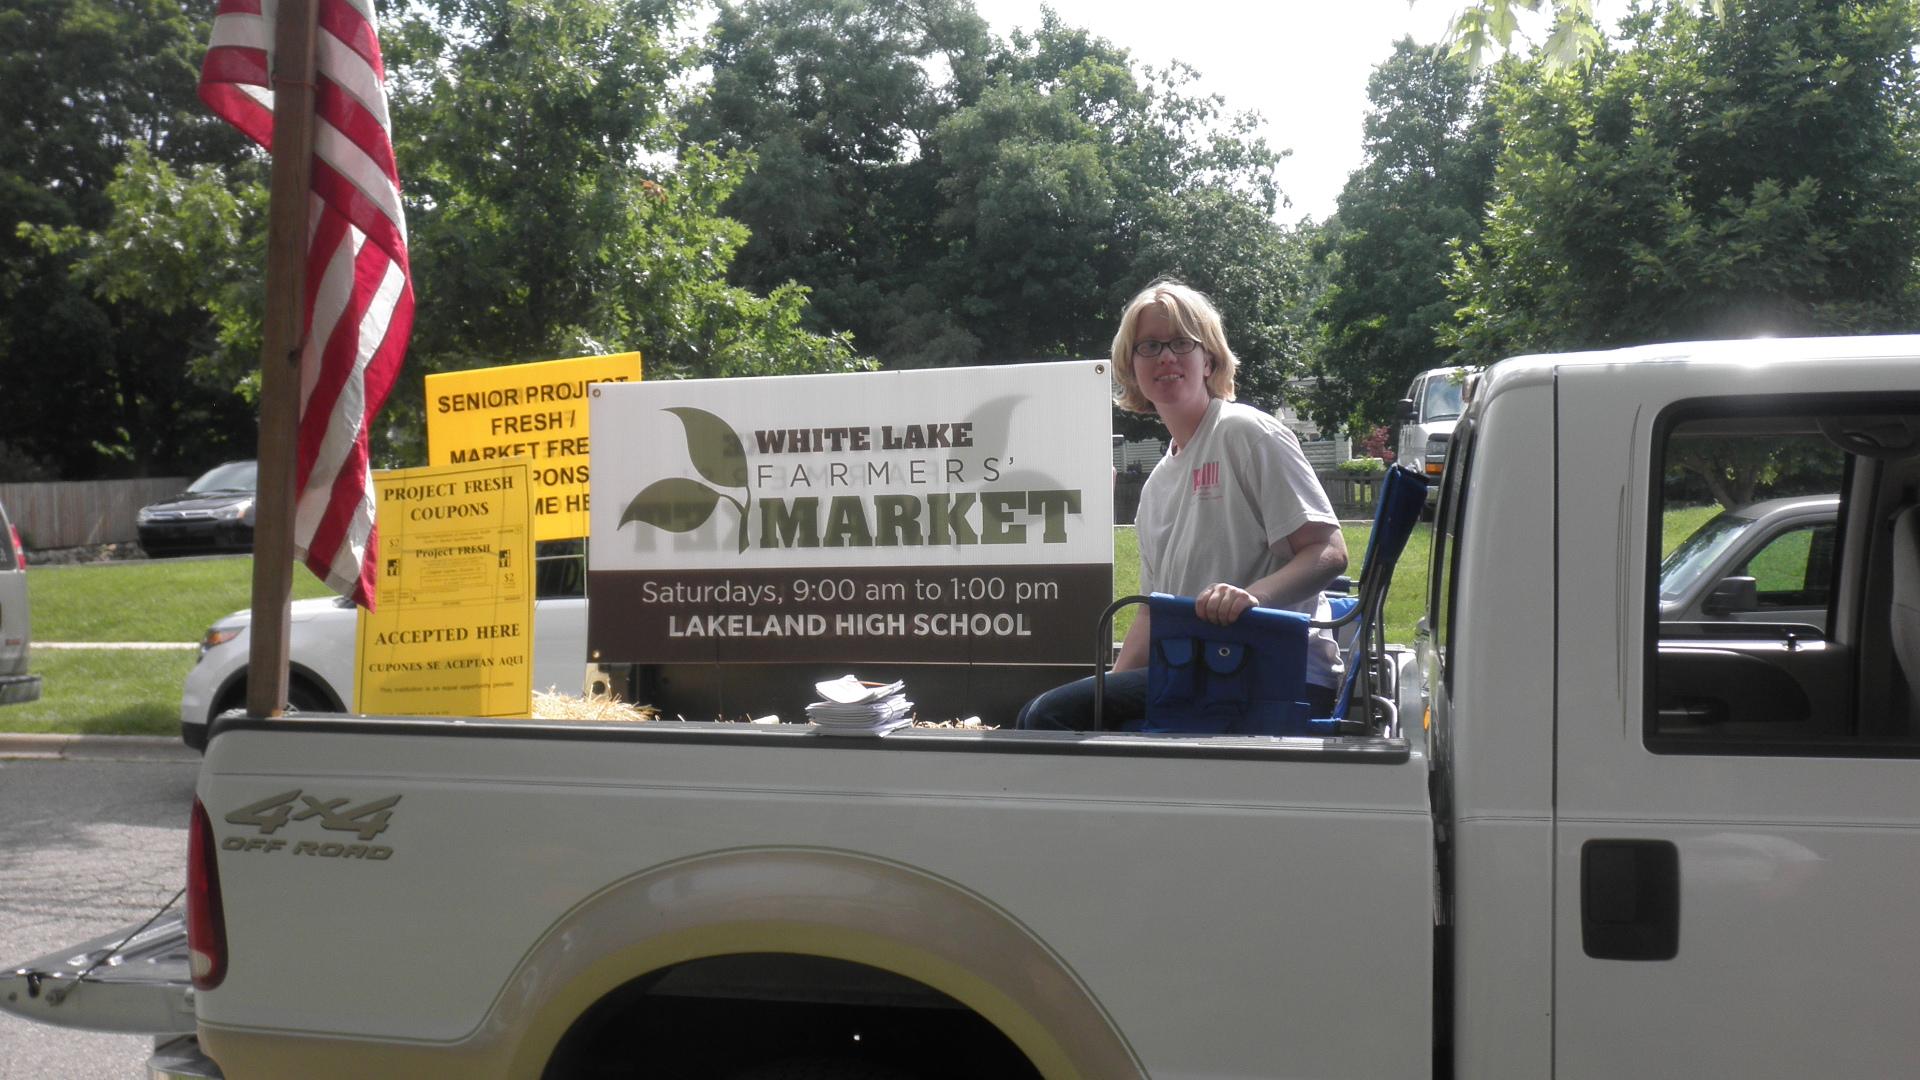 Nikki in the bed of the truck representing White Lake Farmer's Marke